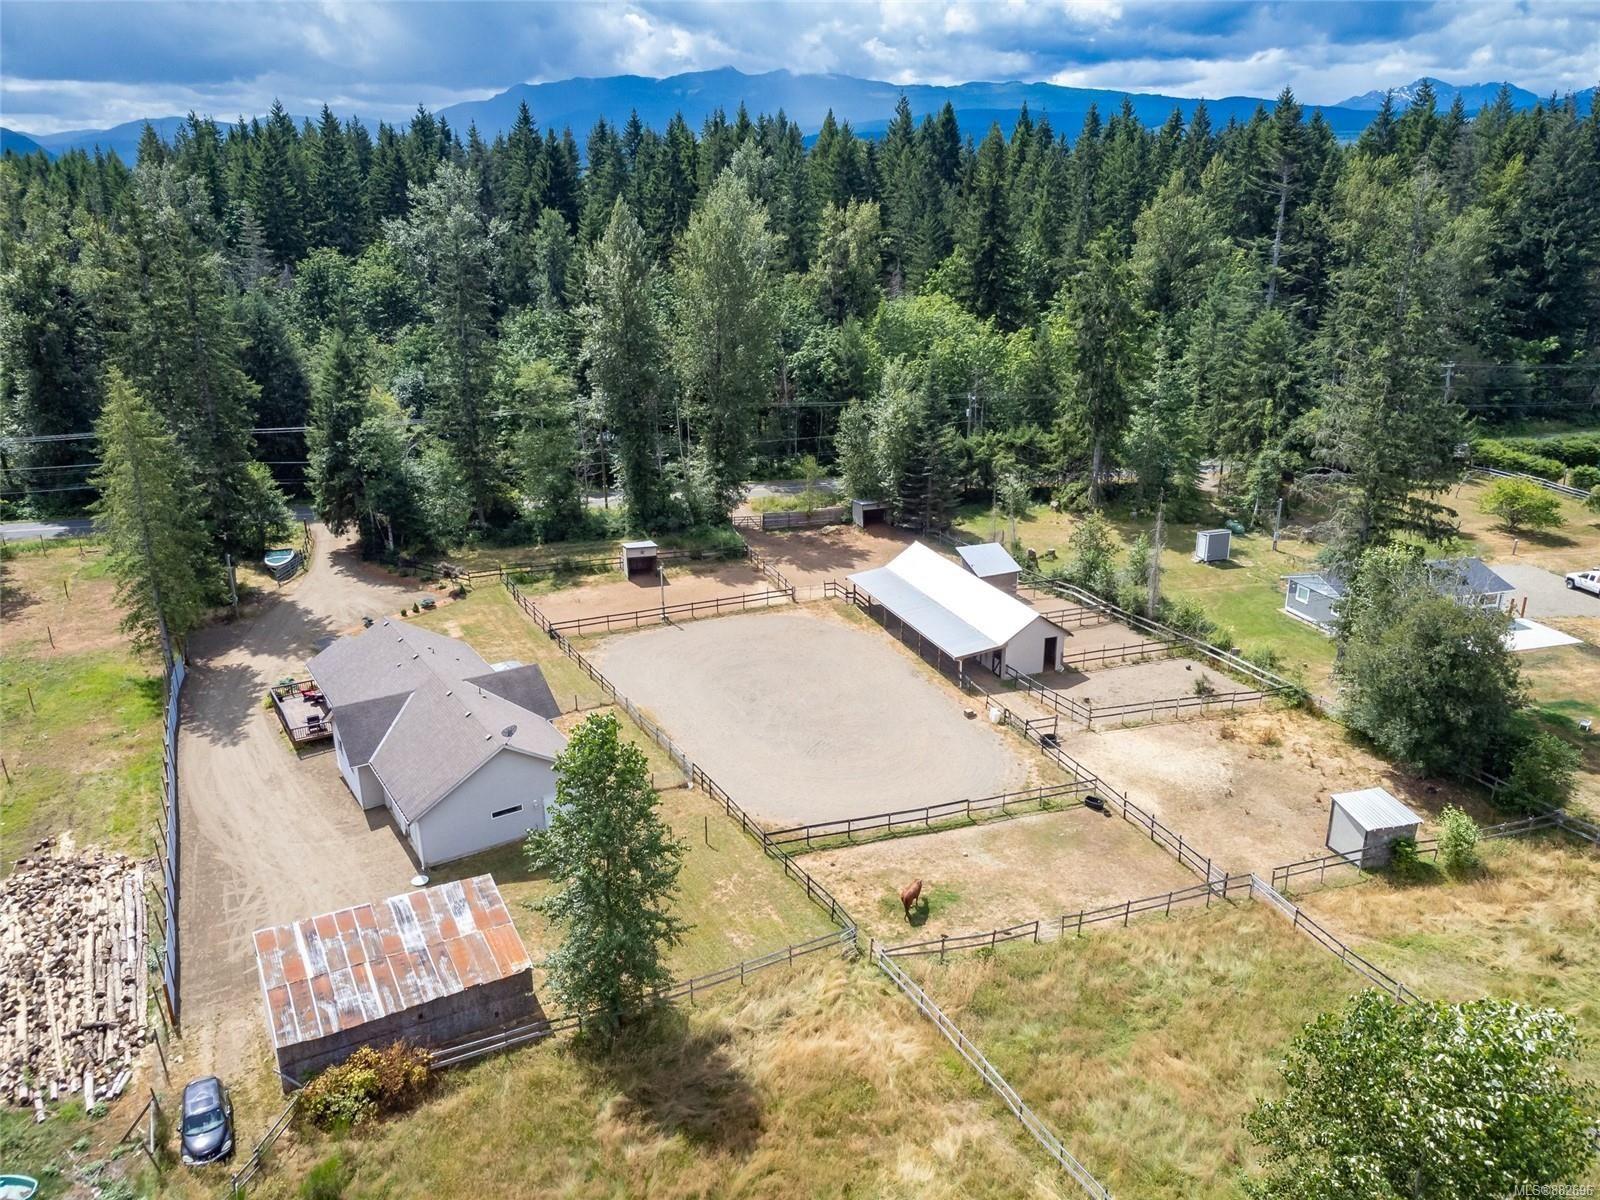 Photo 2: Photos: 3554 MacAulay Rd in : CV Merville Black Creek House for sale (Comox Valley)  : MLS®# 882696